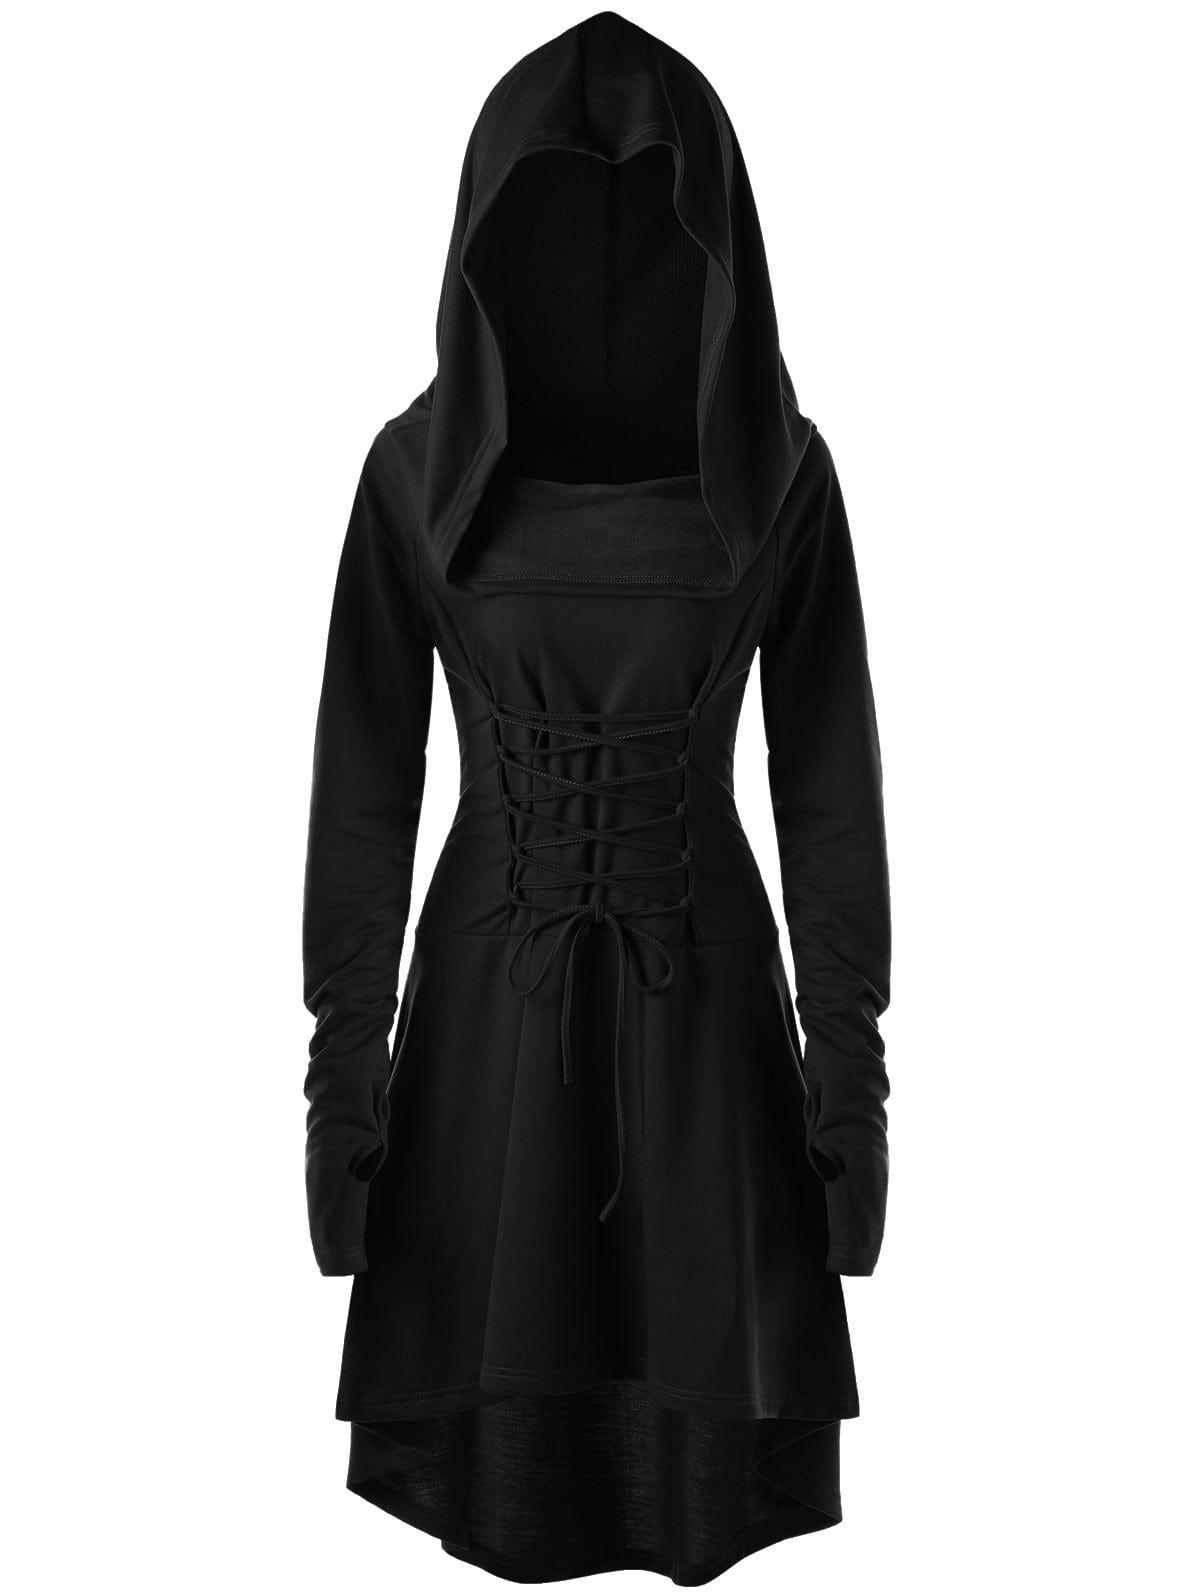 Womens Gothic Punk Lace Up Dress,Loose Hoodies Dress Cloak Costumes Vintage High Low Bandage Sweatshirts Tunic Tops